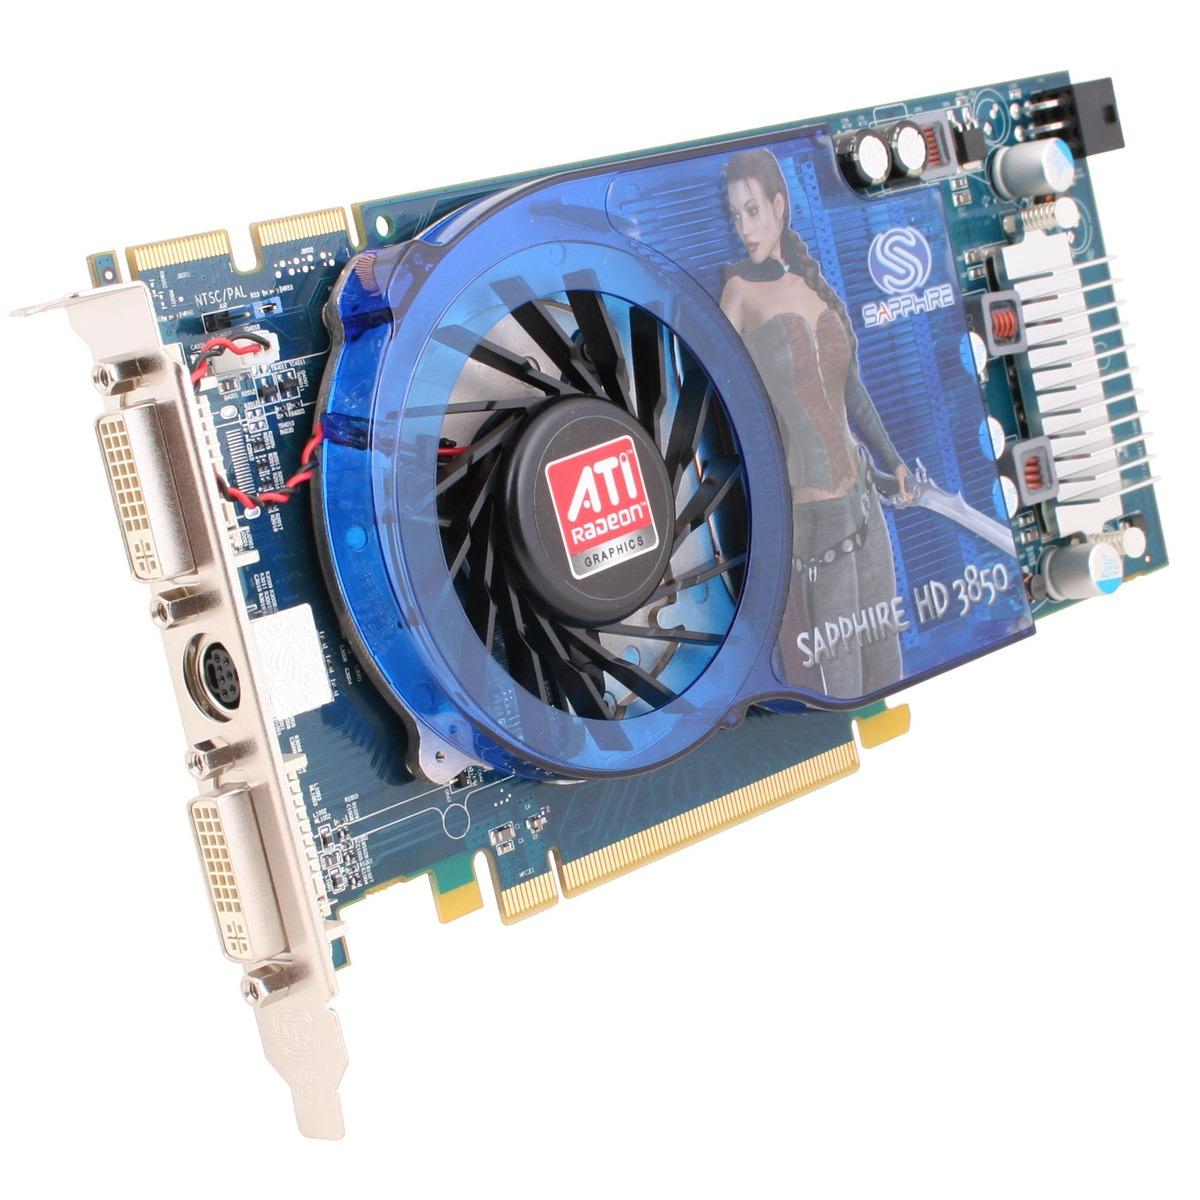 Carte graphique Sapphire Radeon HD 3850 512 MB Sapphire Radeon HD 3850 512 MB - 512 Mo TV-Out/Dual DVI - PCI Express (ATI Radeon HD 3850)